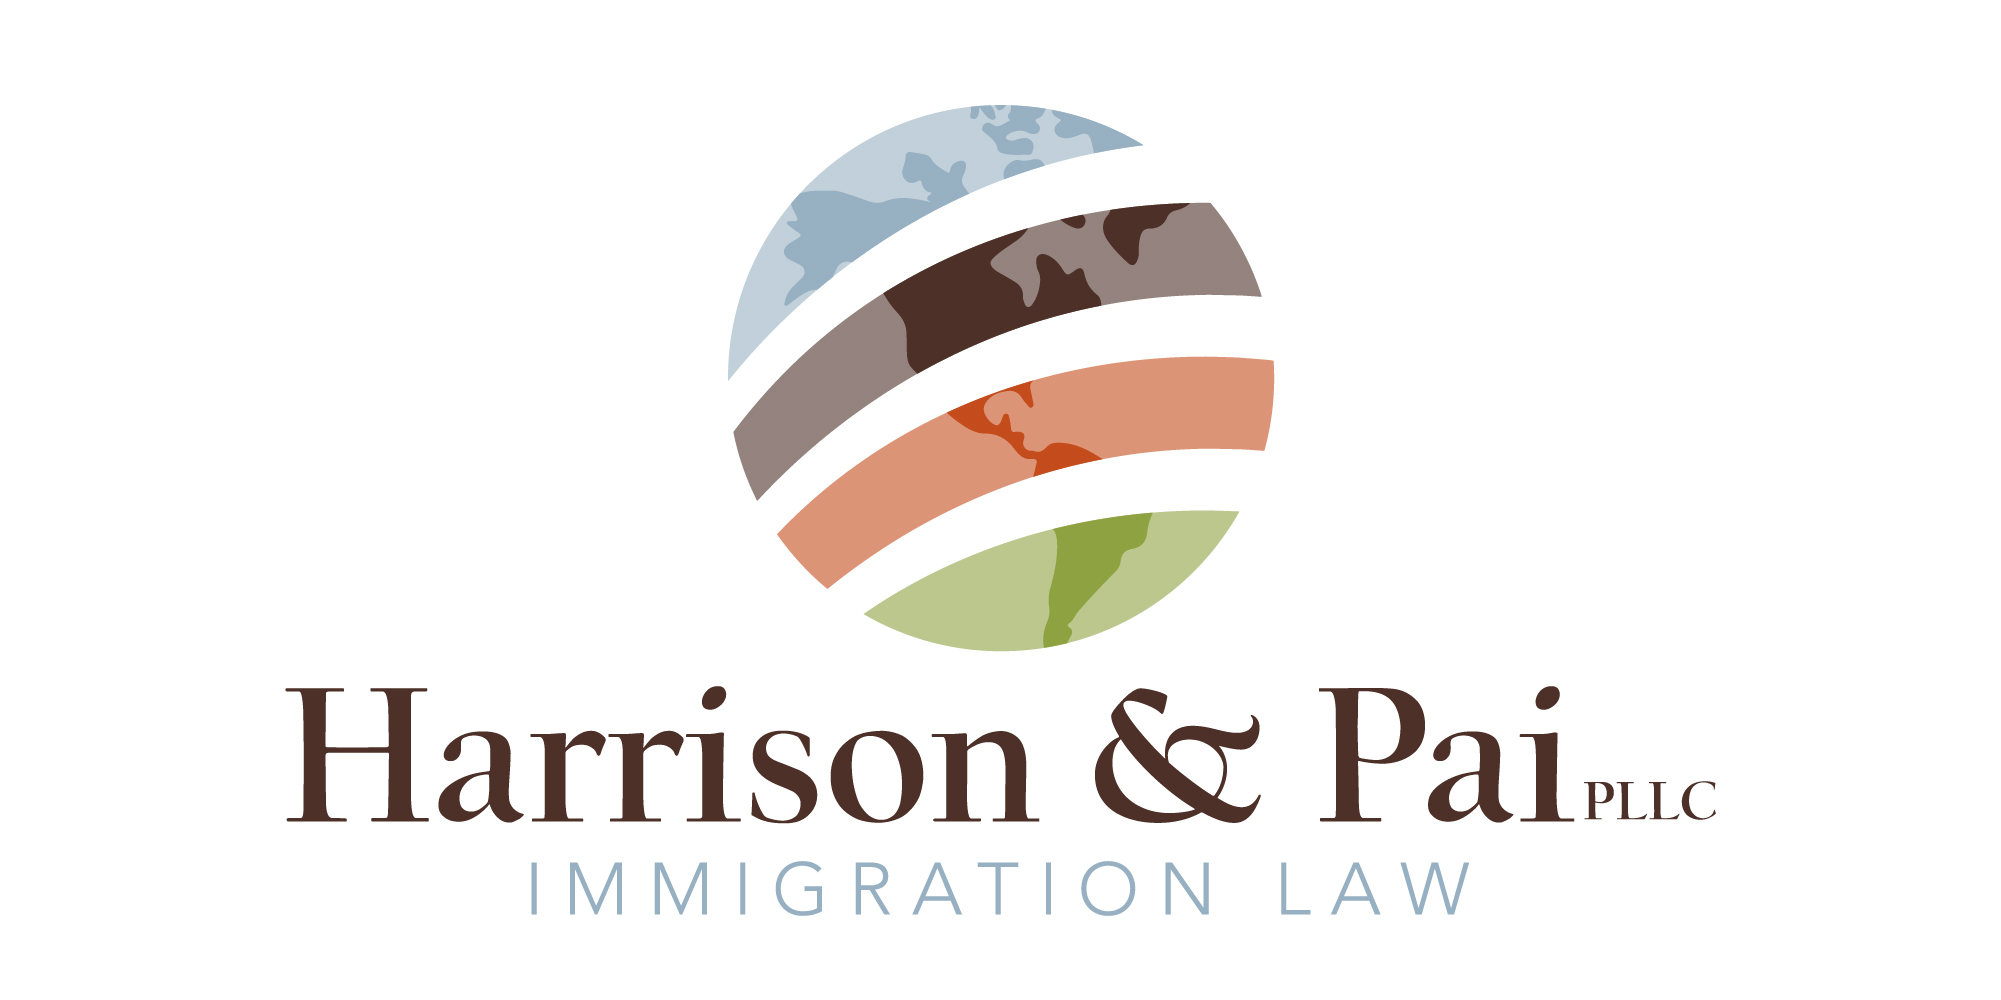 Harrison & Pai Immigration Law